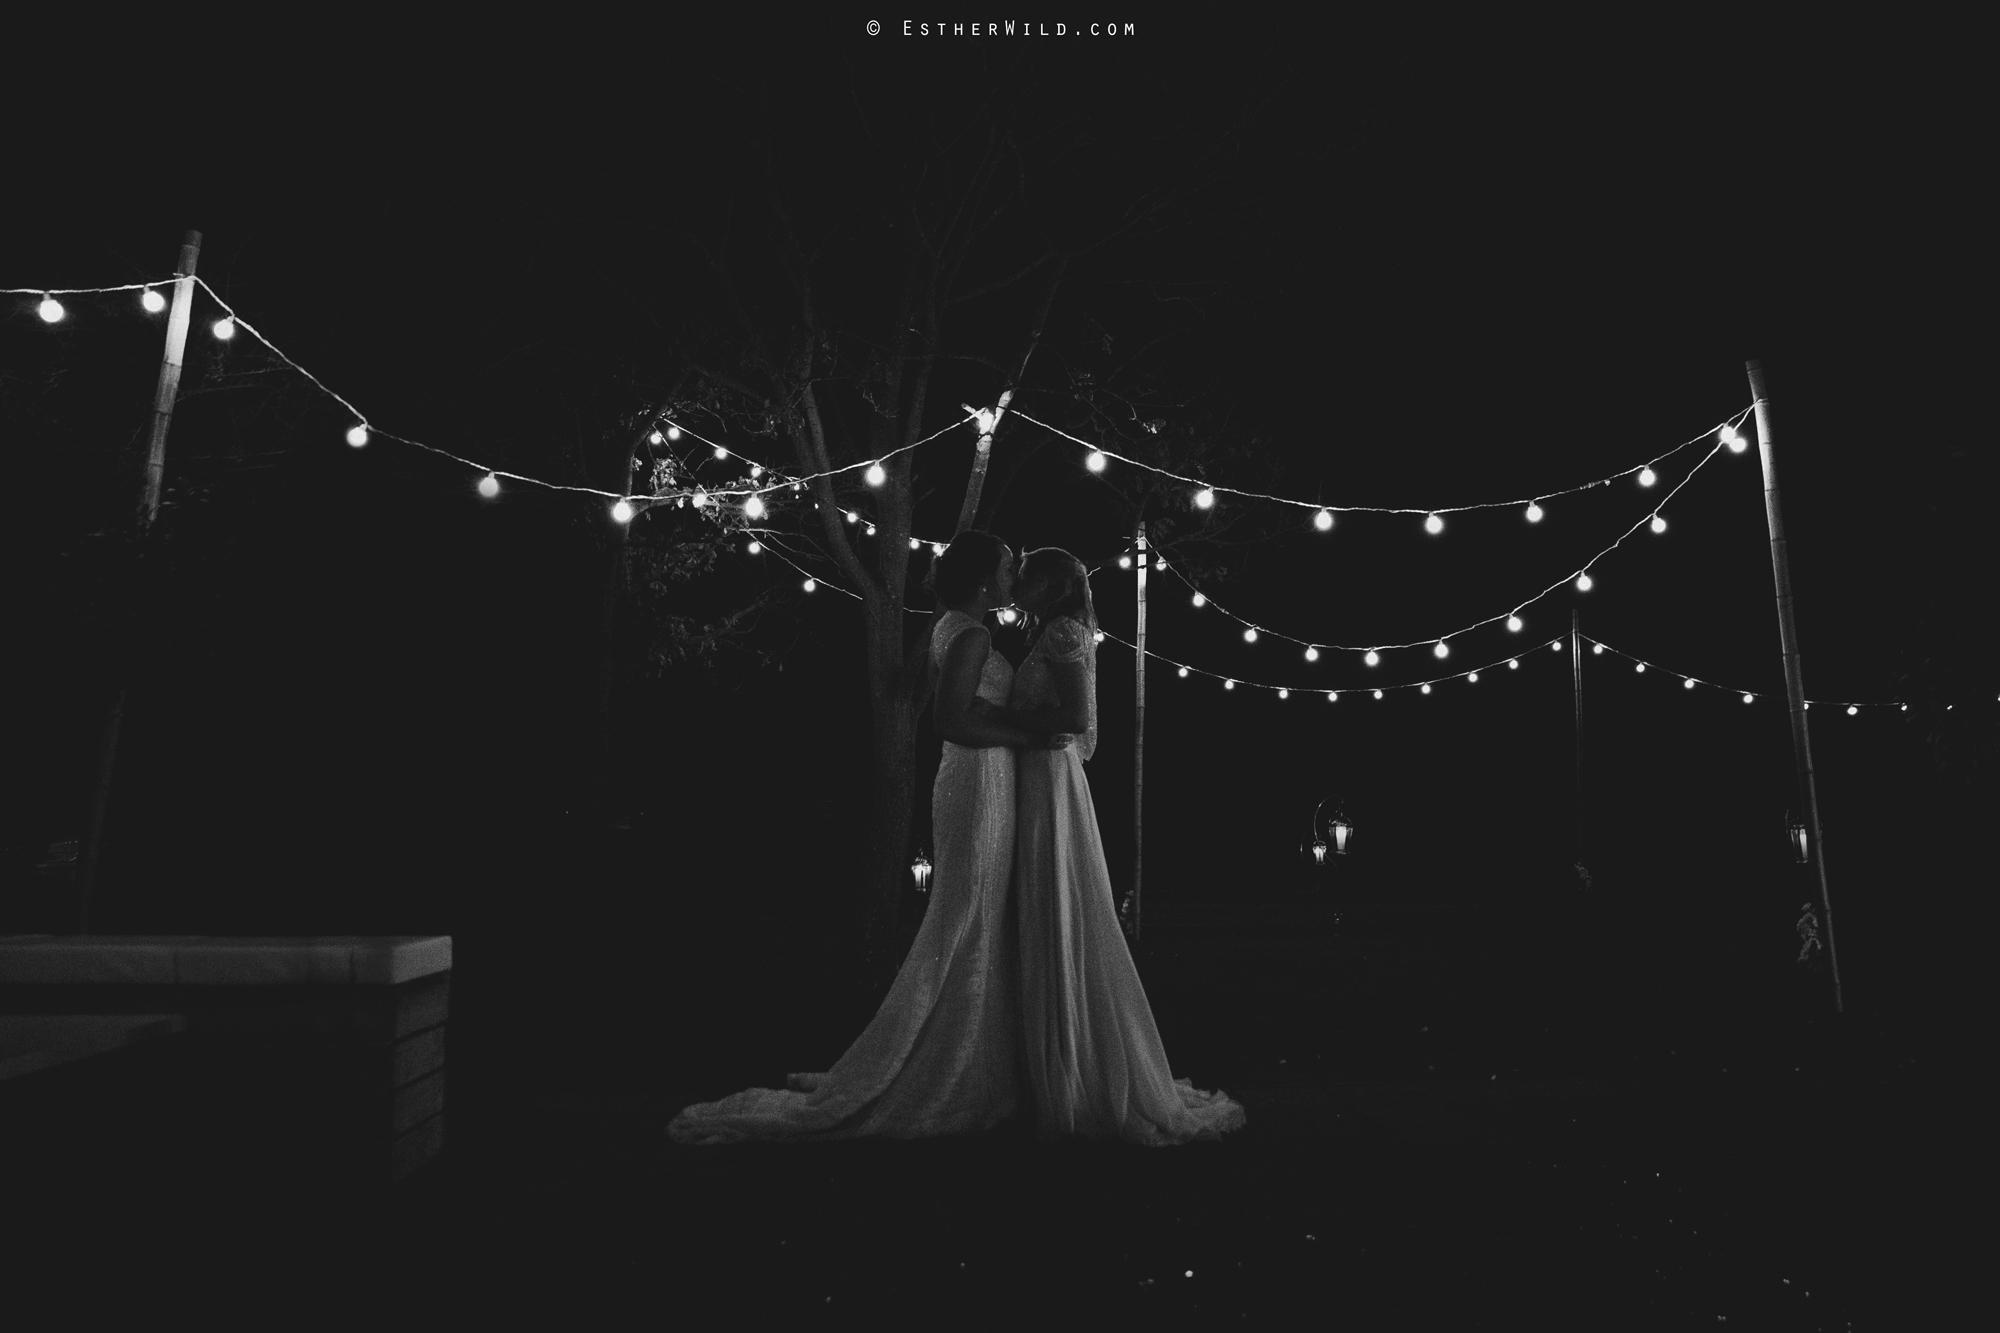 Elms_Barn_Weddings_Suffolk_Photographer_Copyright_Esther_Wild_IMG_3214-1.jpg